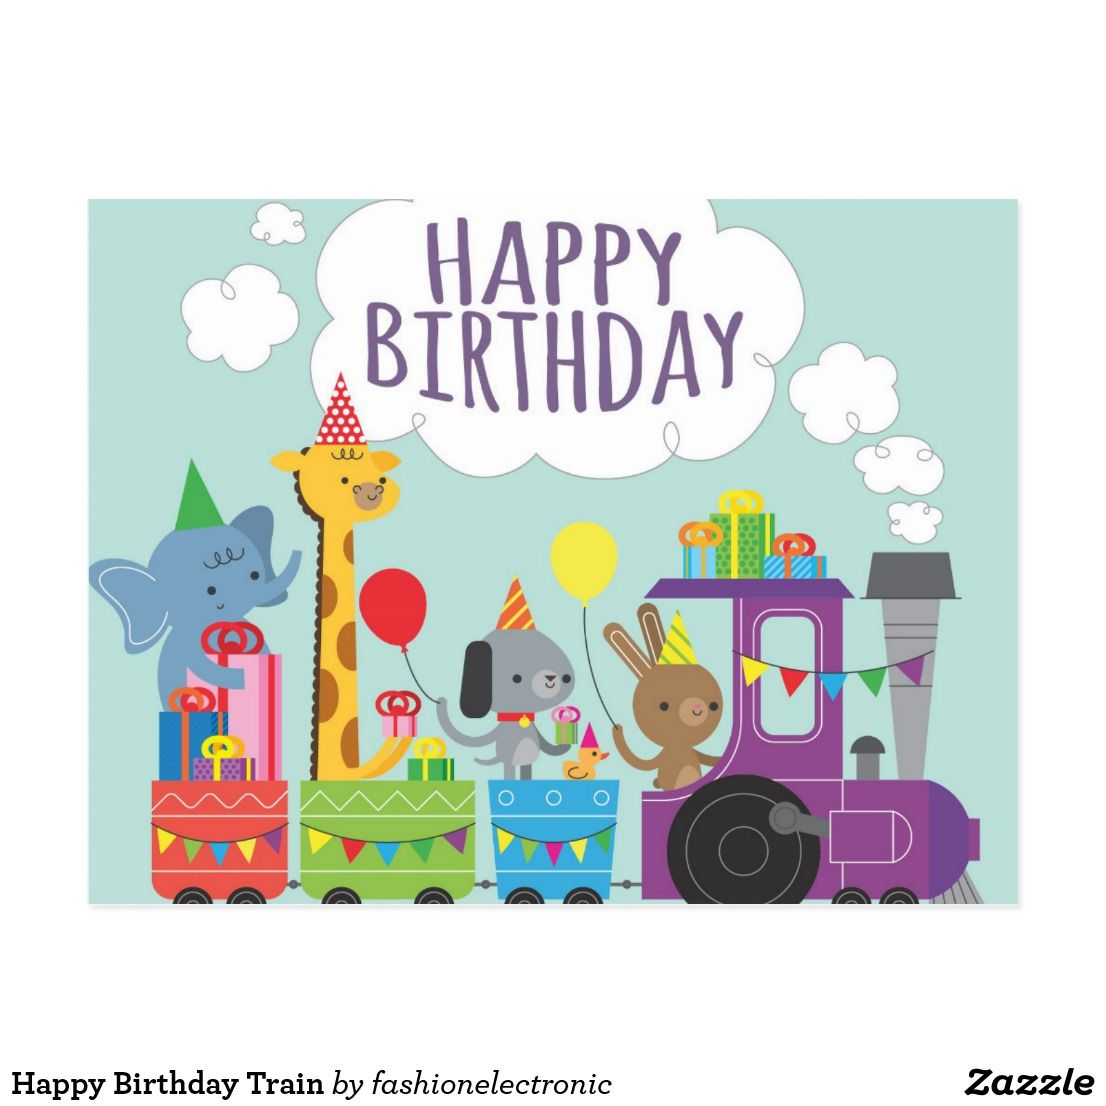 Happy Birthday Train Postcard Zazzle Com In 2021 Happy Birthday Kids Happy Birthday Animals Happy Birthday Cards